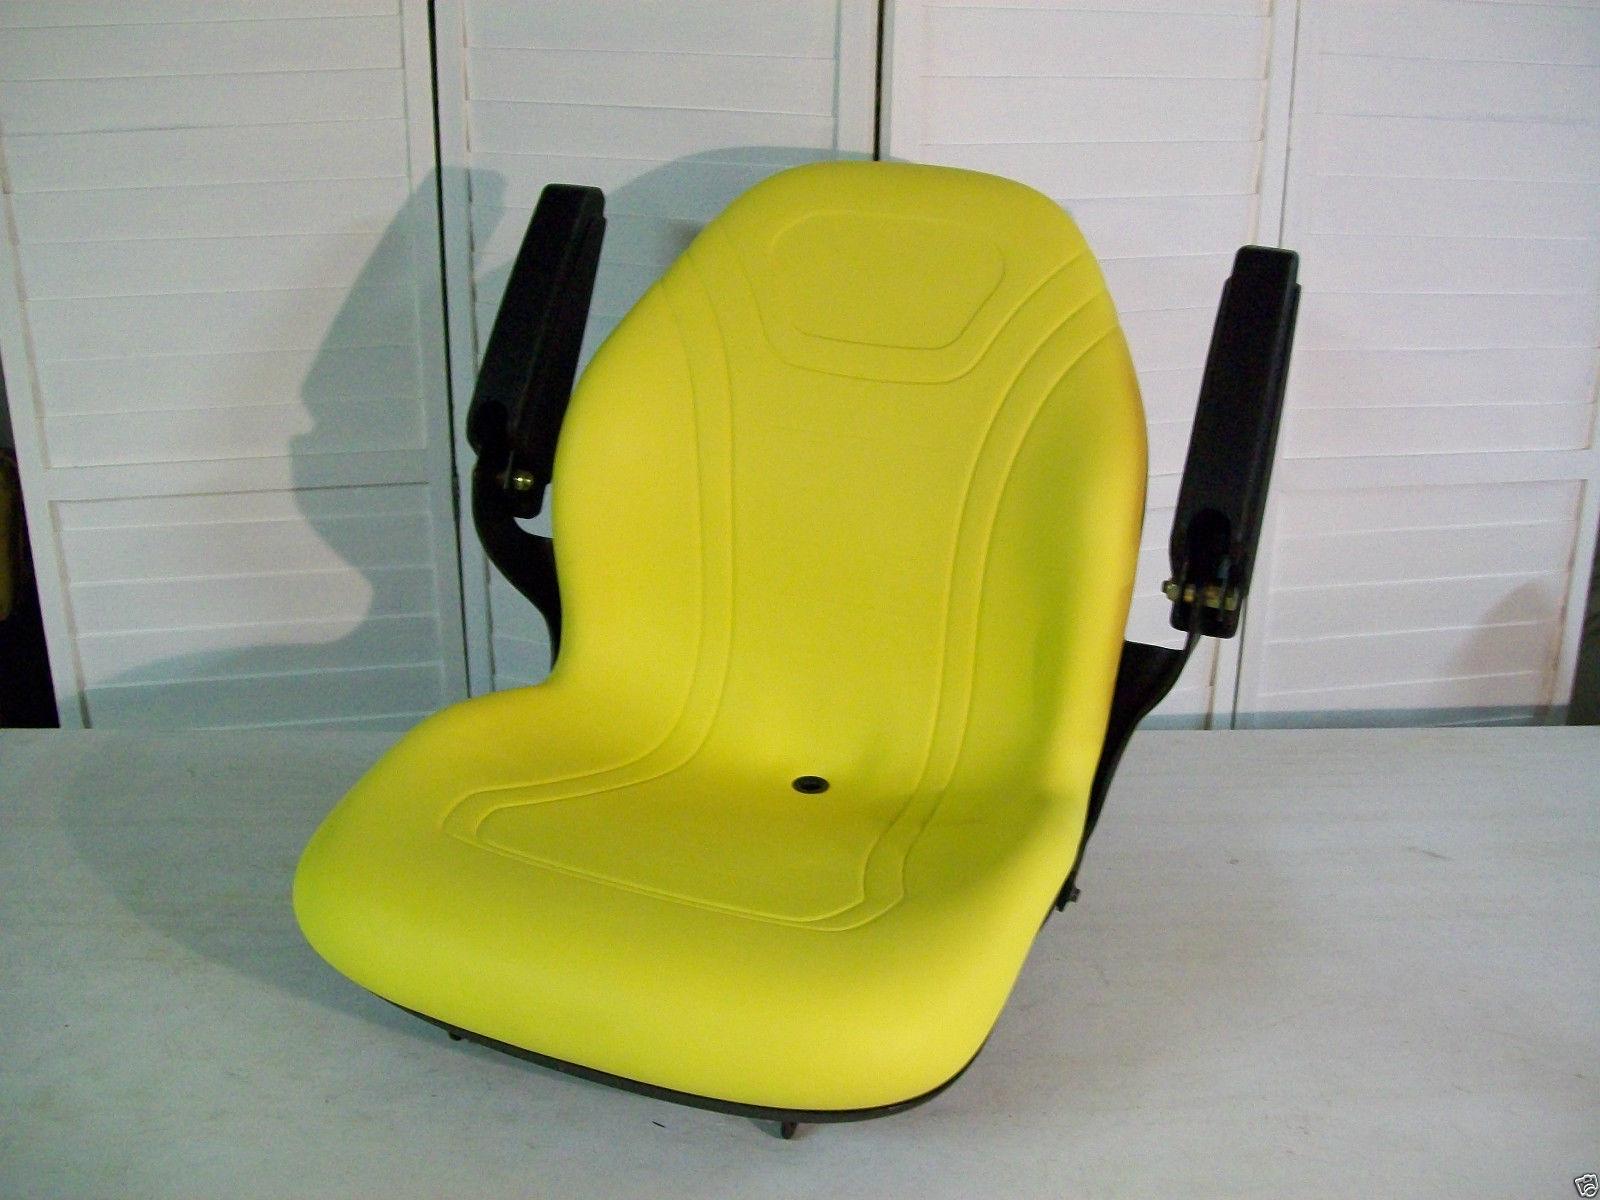 X750 John Deere Seat Switch Wiring Diagram Yellow Fits X534 X540 X584 X590 X754 X758 Rh Warehouse Com Problem Backhoe